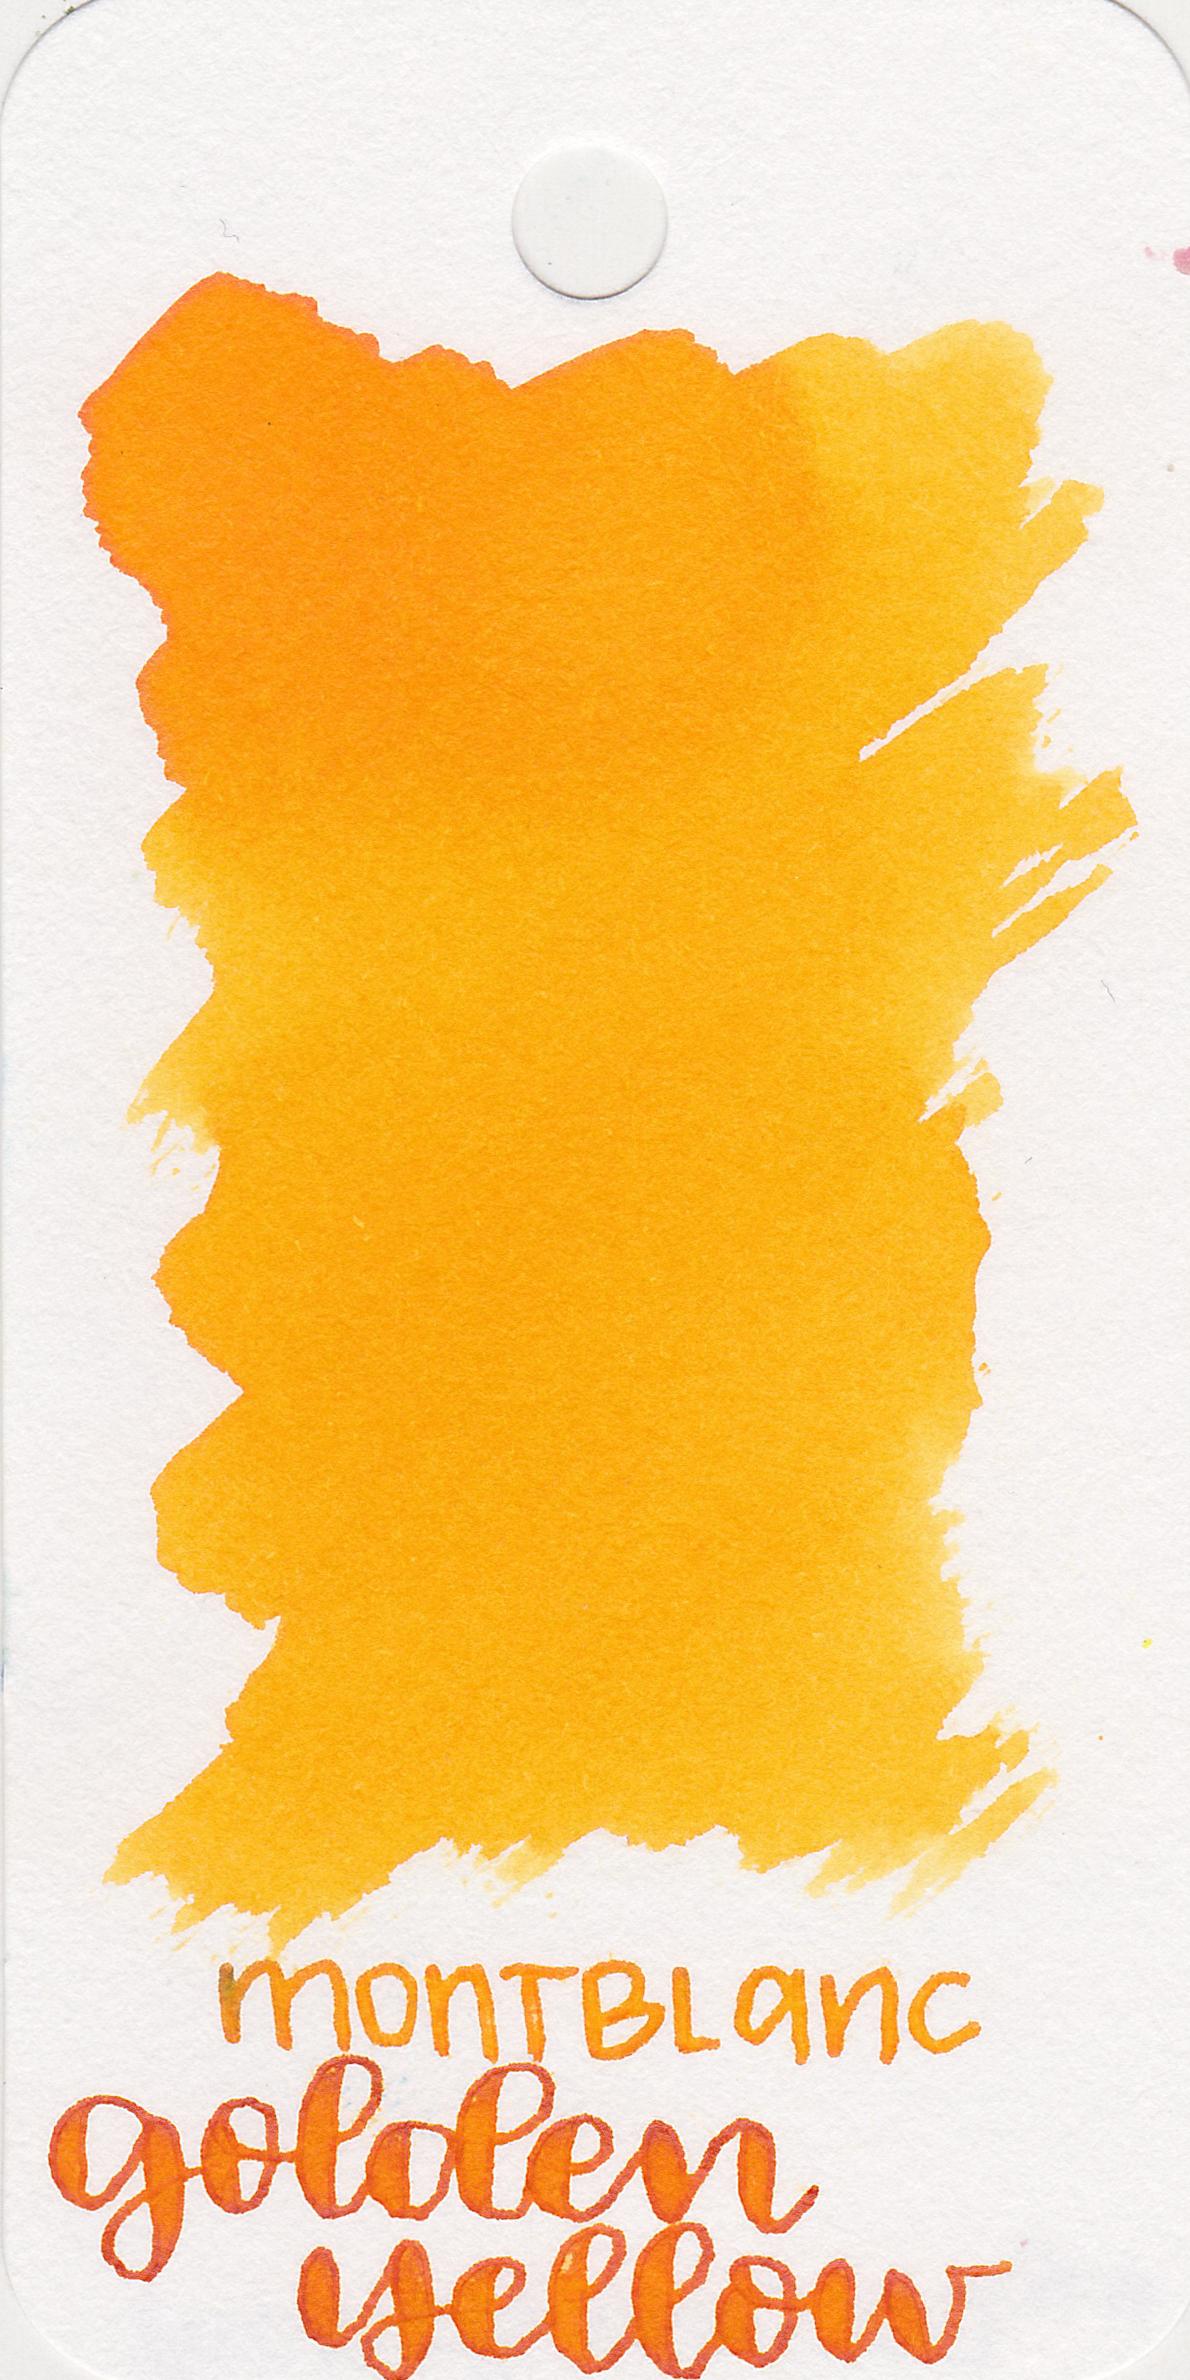 mb-golden-yellow-1.jpg